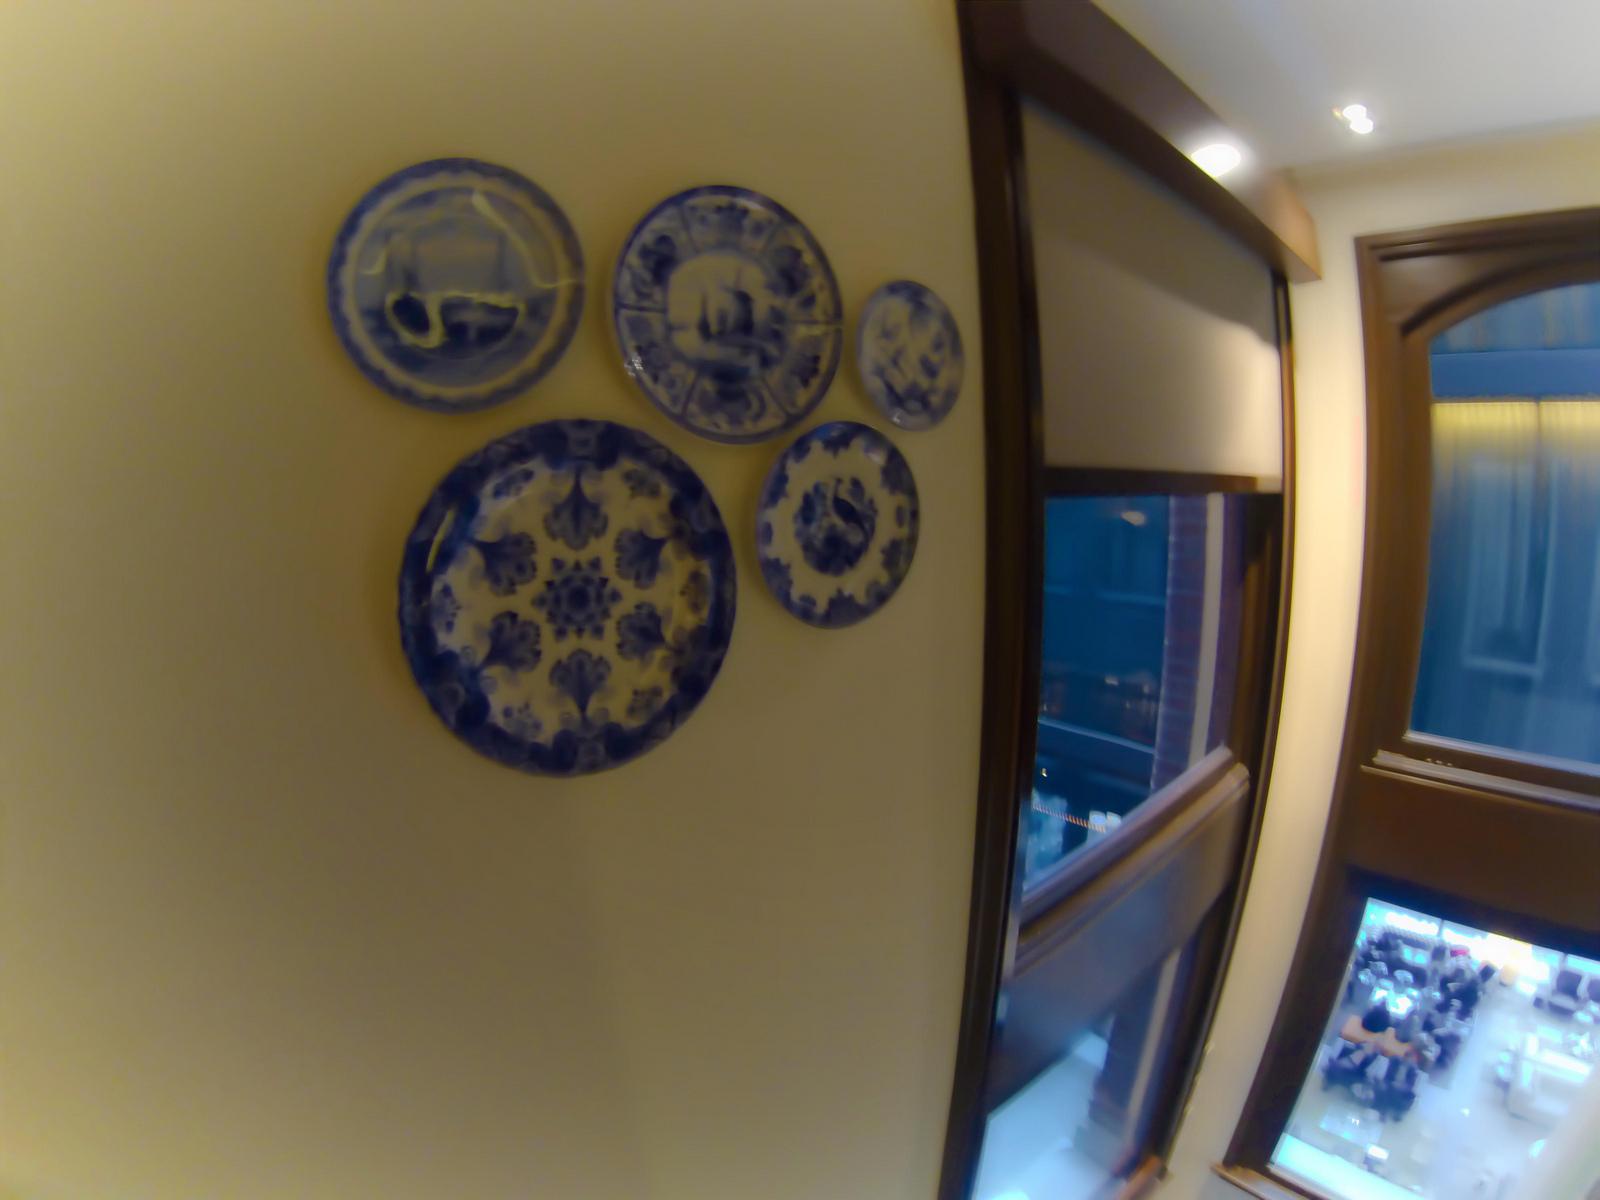 conservatorium-hotel-amsterdam-bedroom-wall-Dutch-Delft-plate-collection.jpg